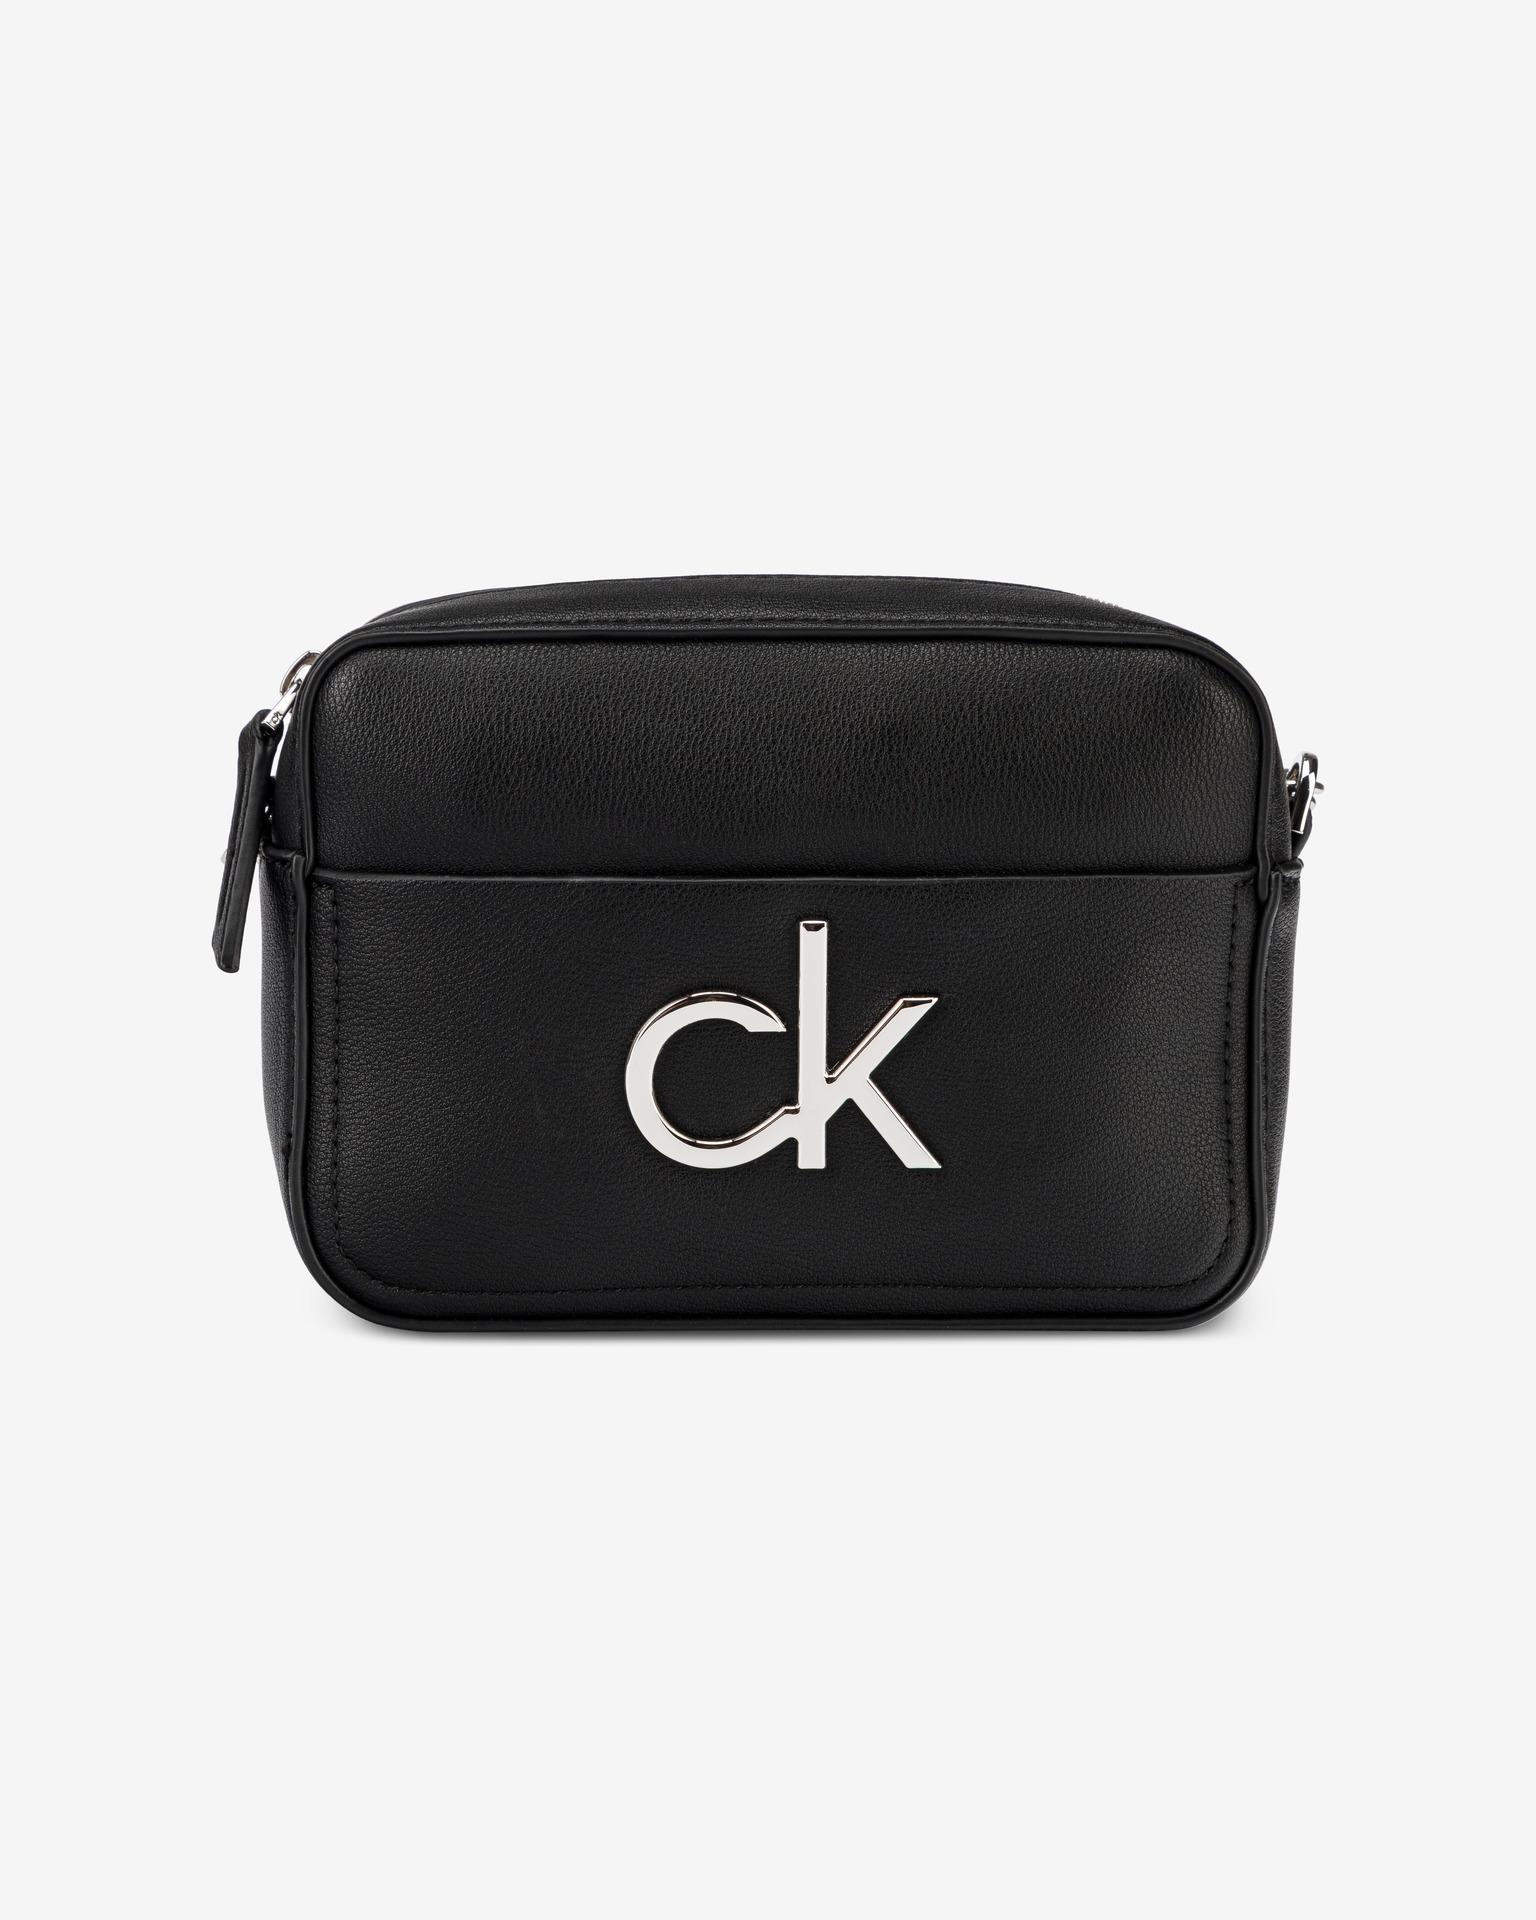 Calvin Klein černé crossbody kabelka